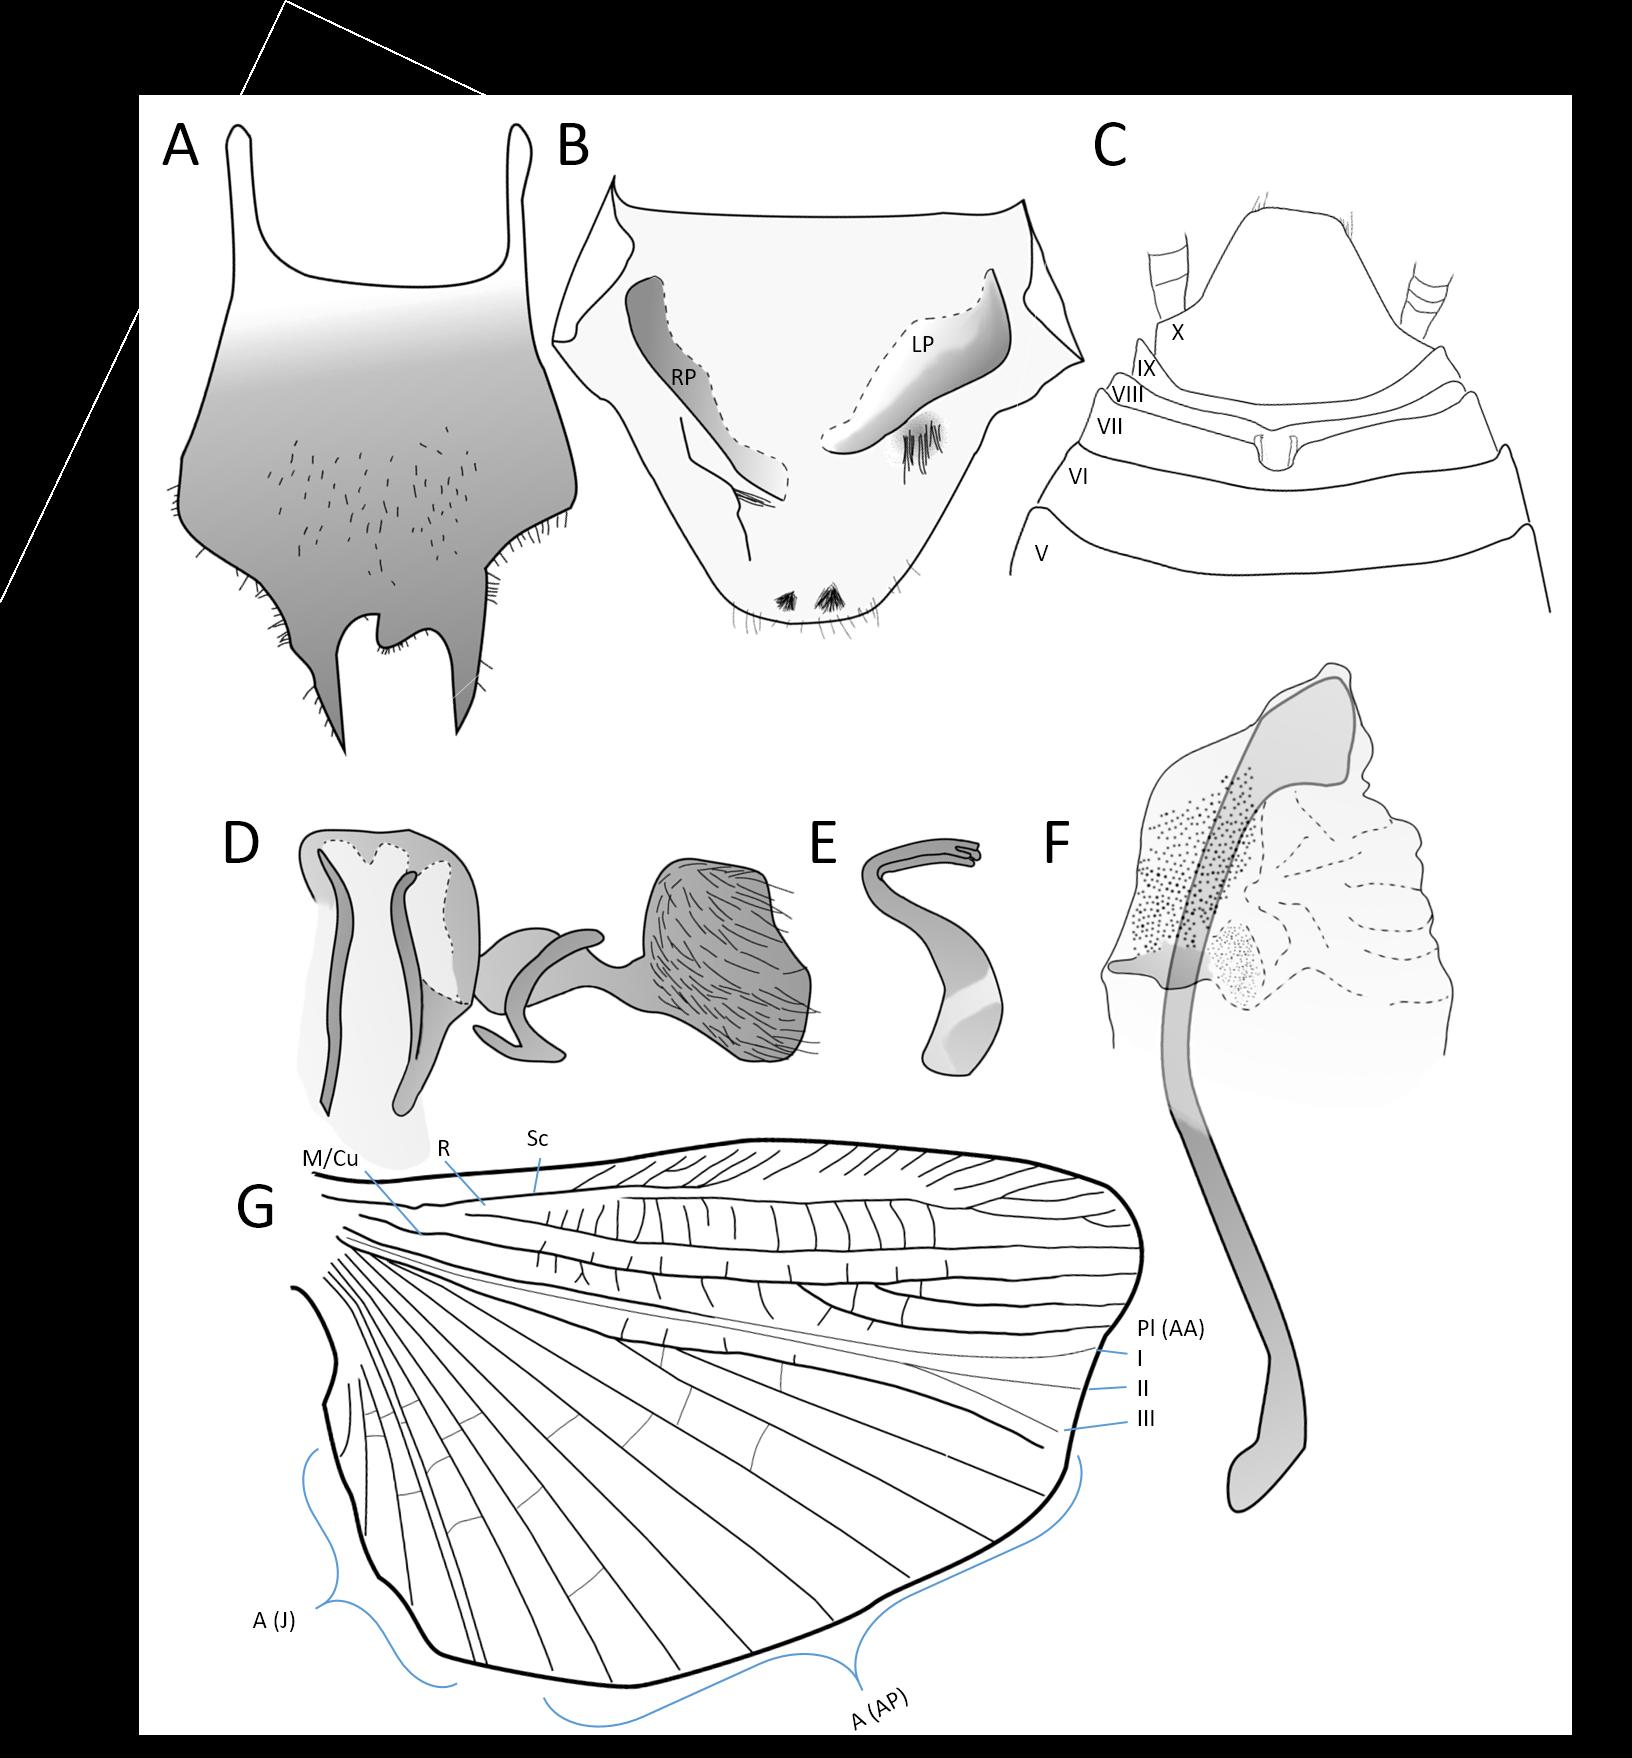 Ischnoptera galibi parts